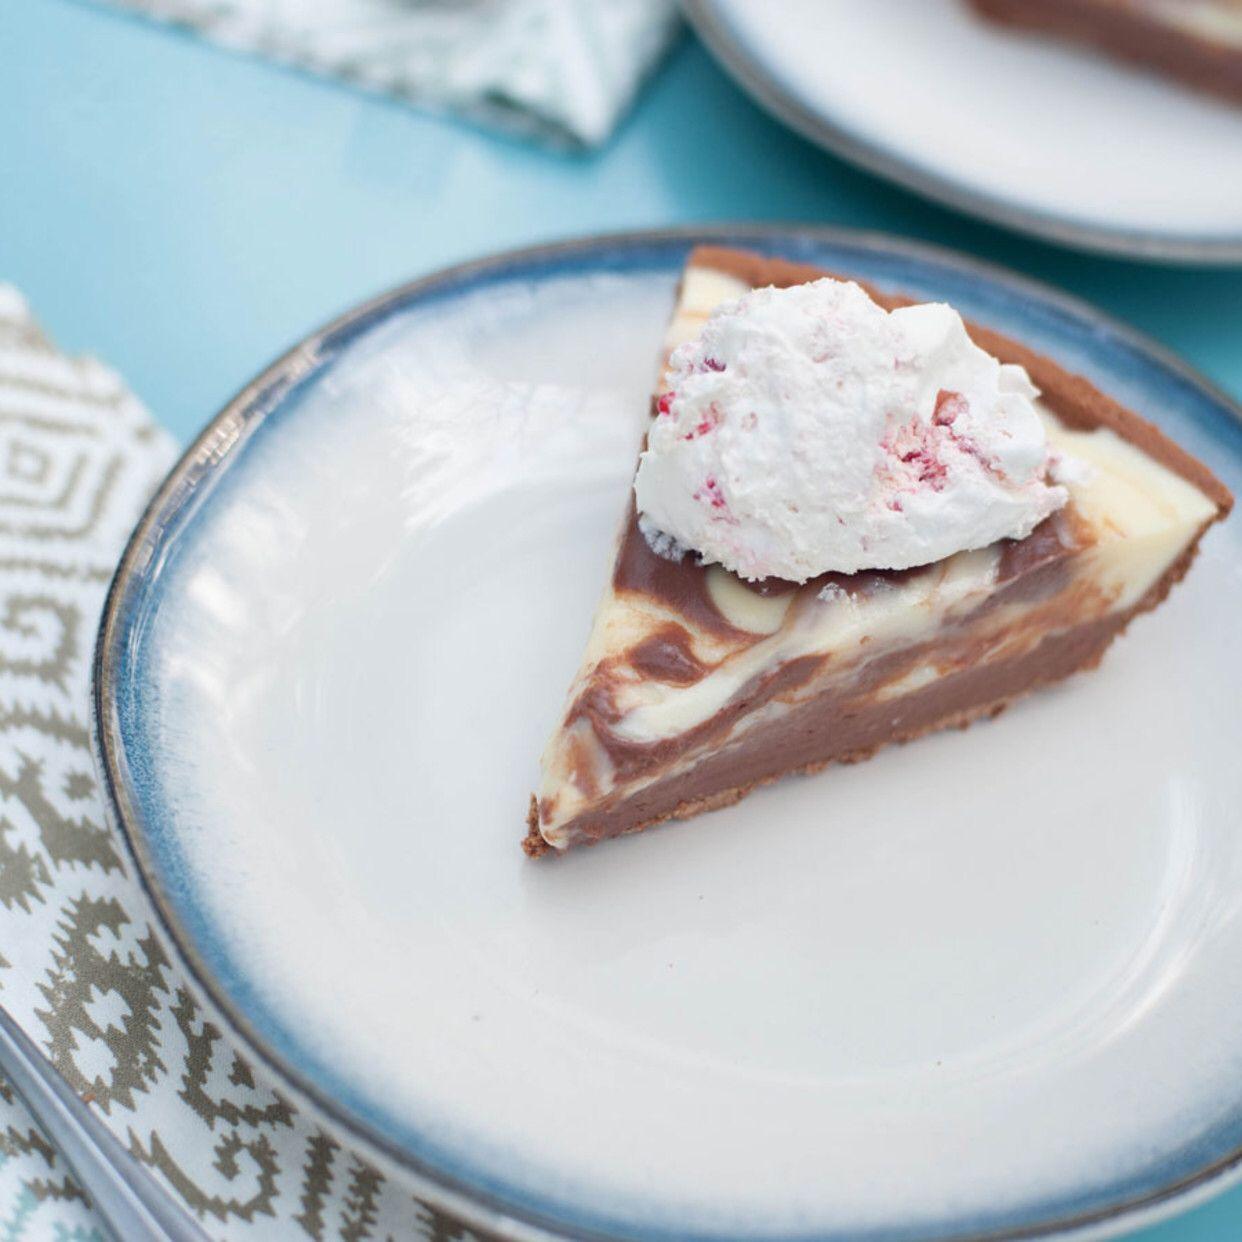 Chocolate And Vanilla Pudding Swirl Pie Recipe Food Network Recipes Vanilla Pudding Best Comfort Food